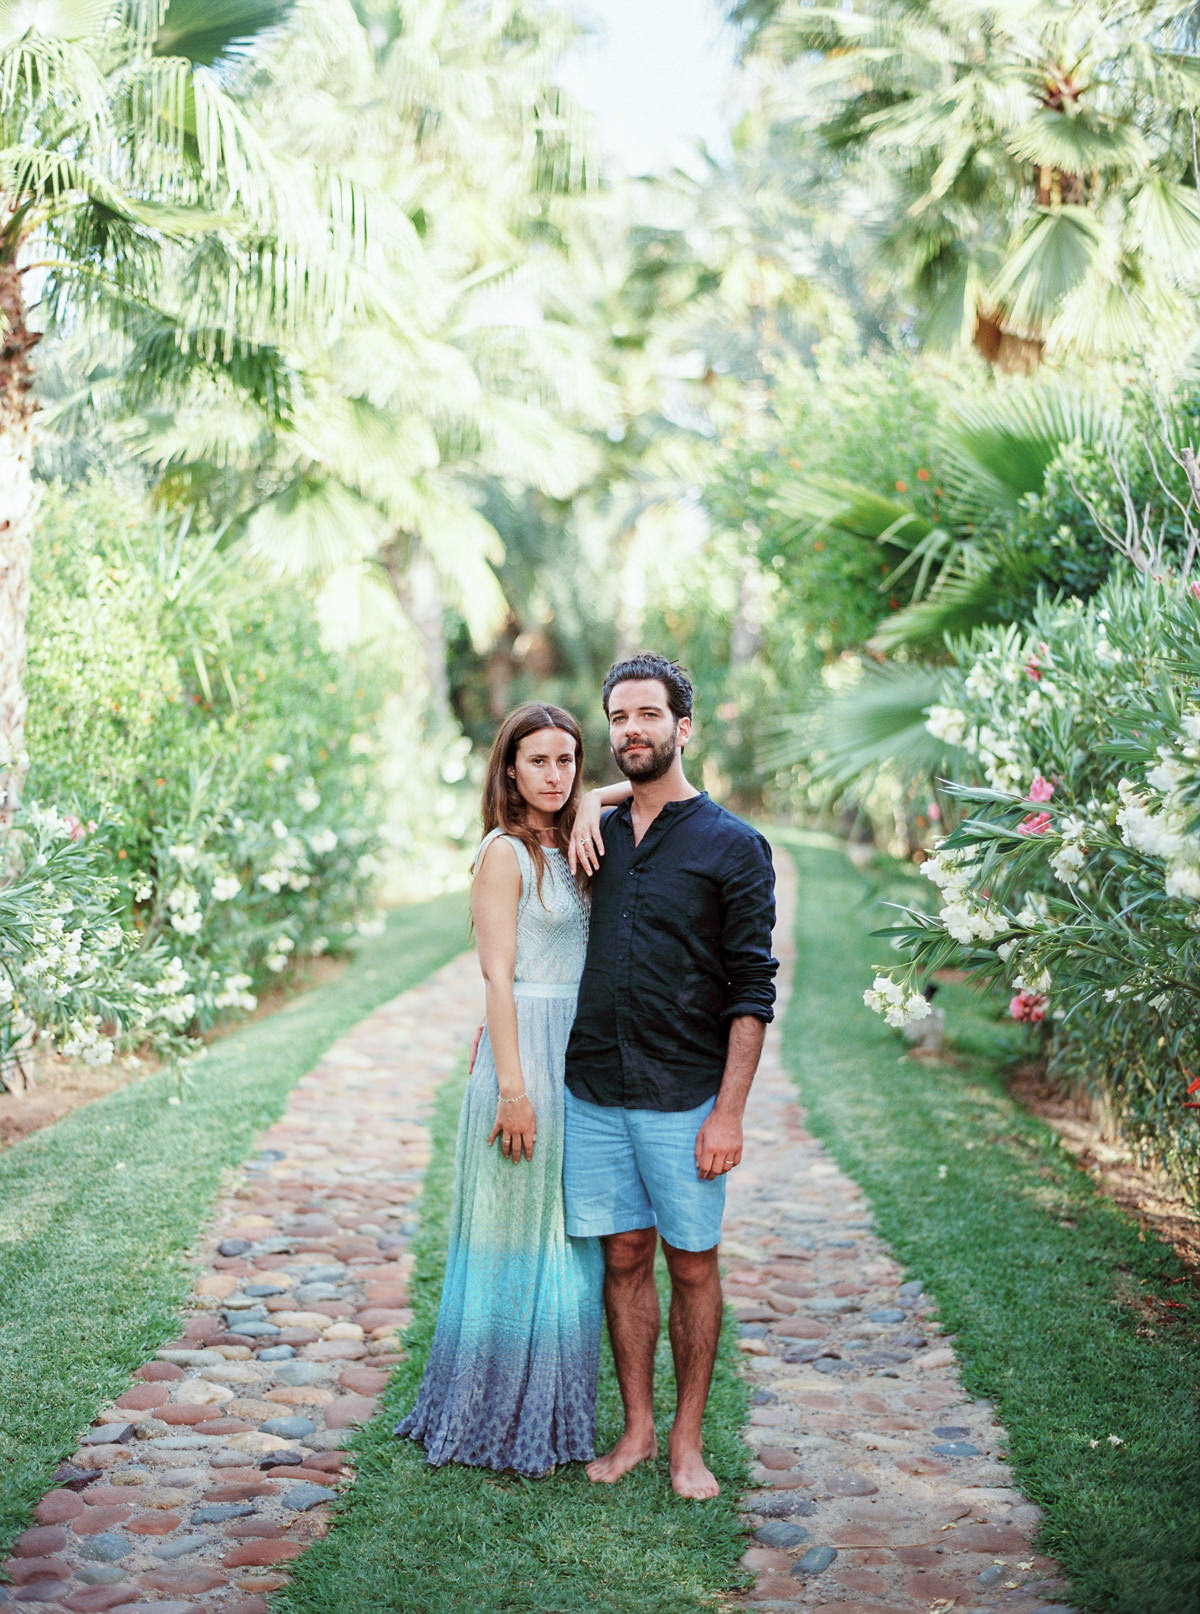 0664-lifestories-mariage-marrakech-2016-TiffxPJ-Maroc-127